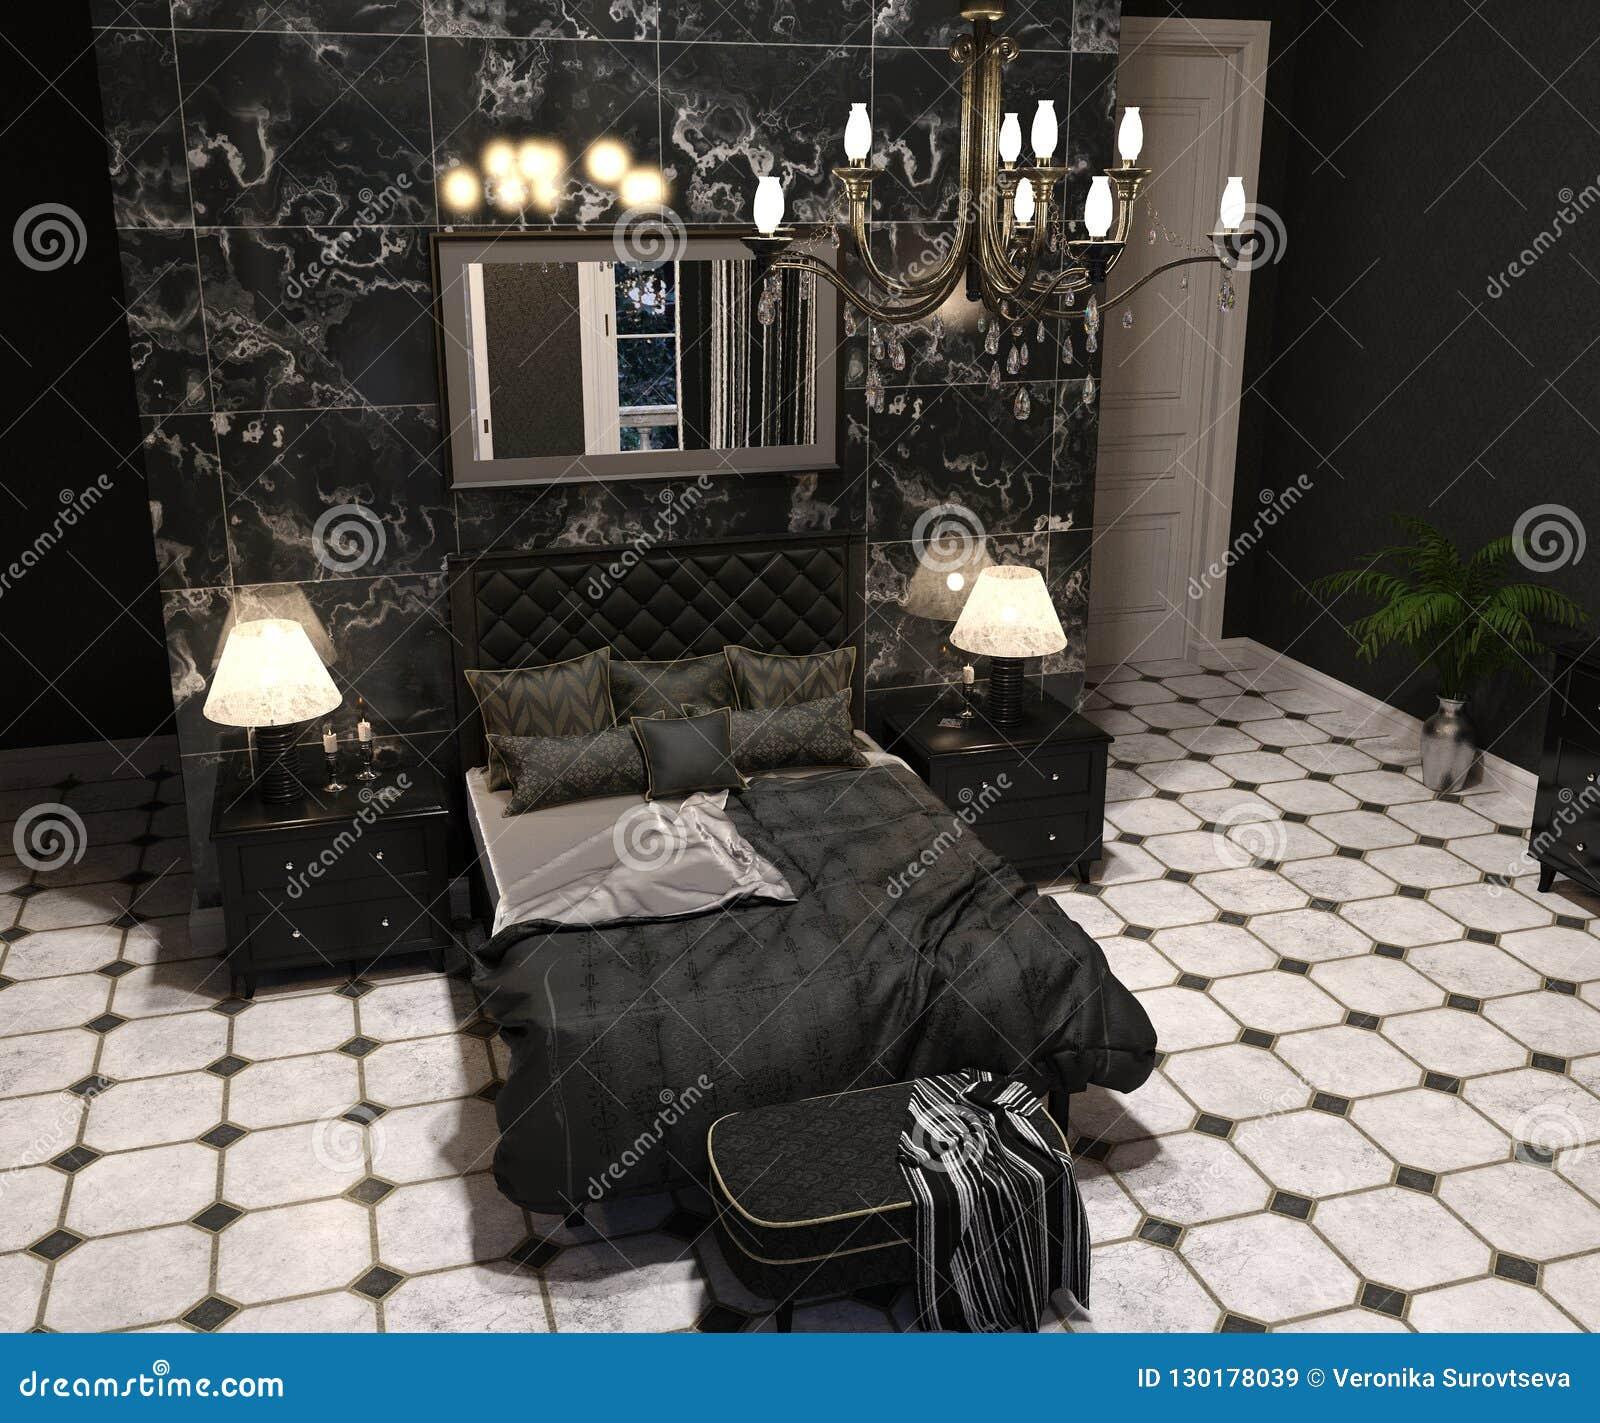 Luxury Goth Living Room Stock Image Image Of Flat Drape 130178039